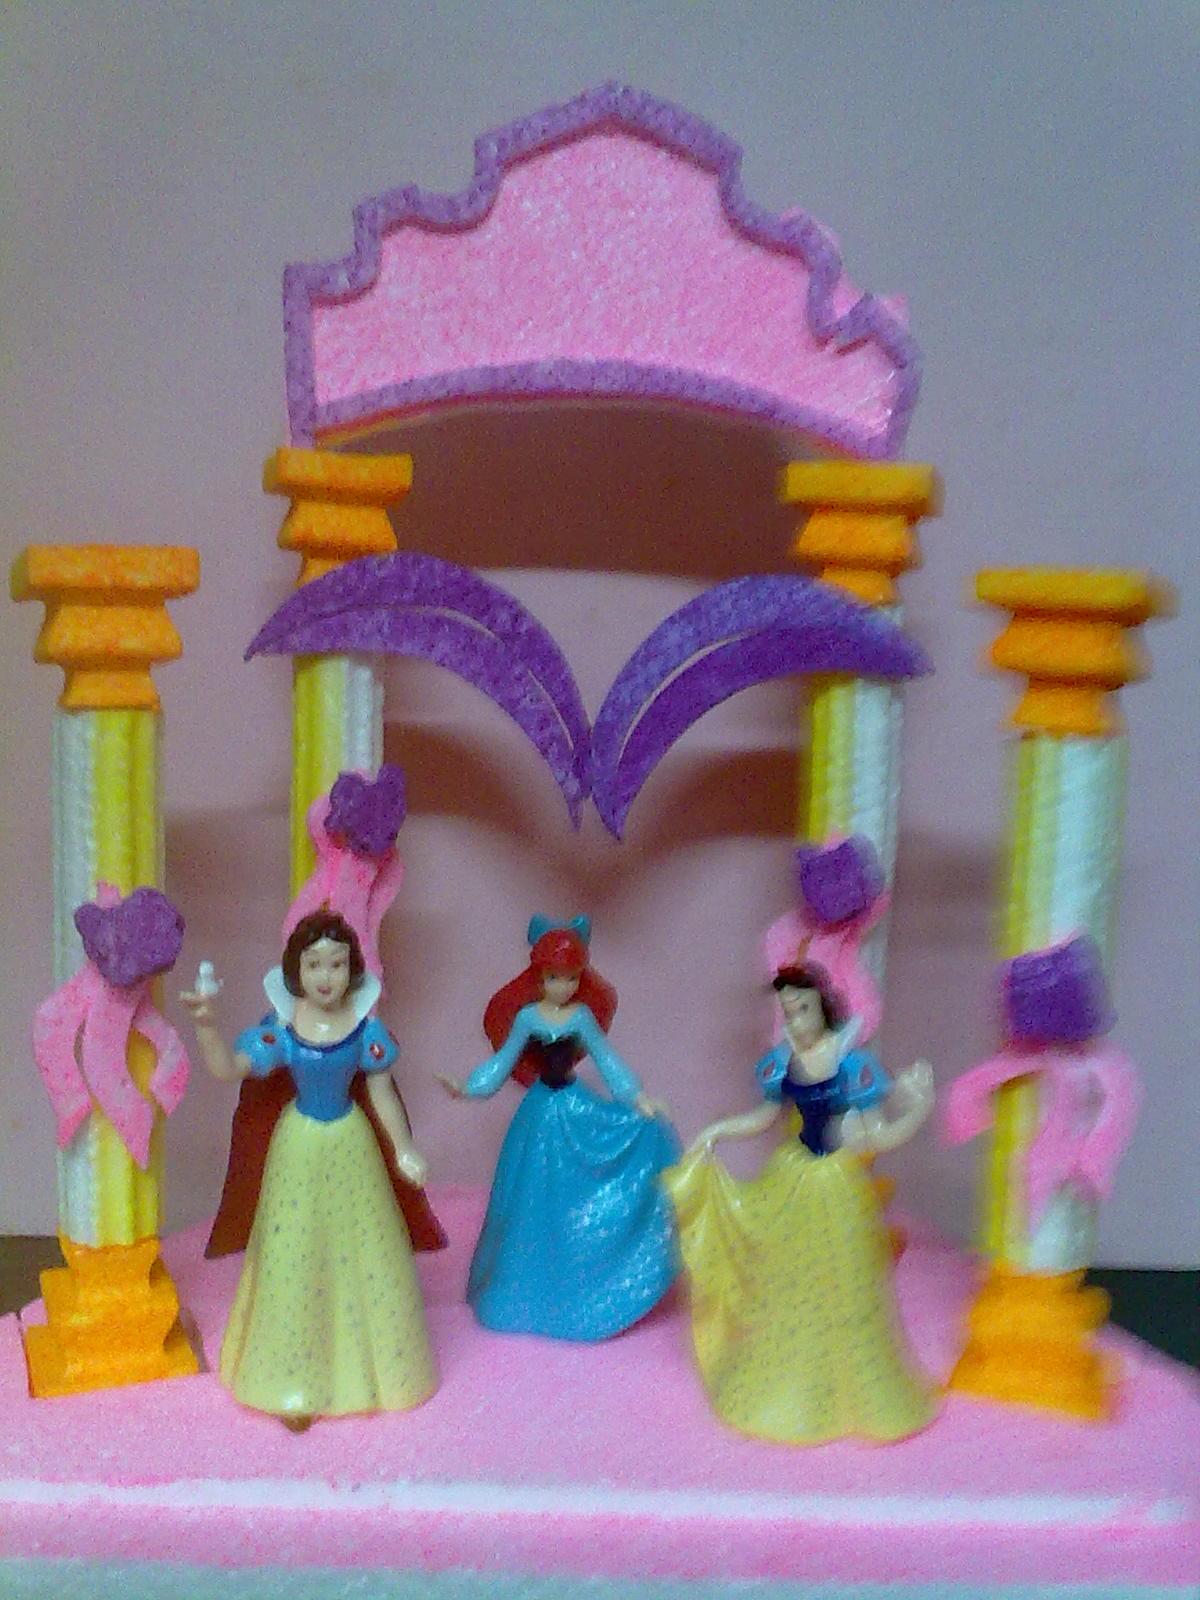 Cake Decorating Plastic Figurines : Weddings Birthdays Atbp.: Cake Topper Rubberized Plastic ...